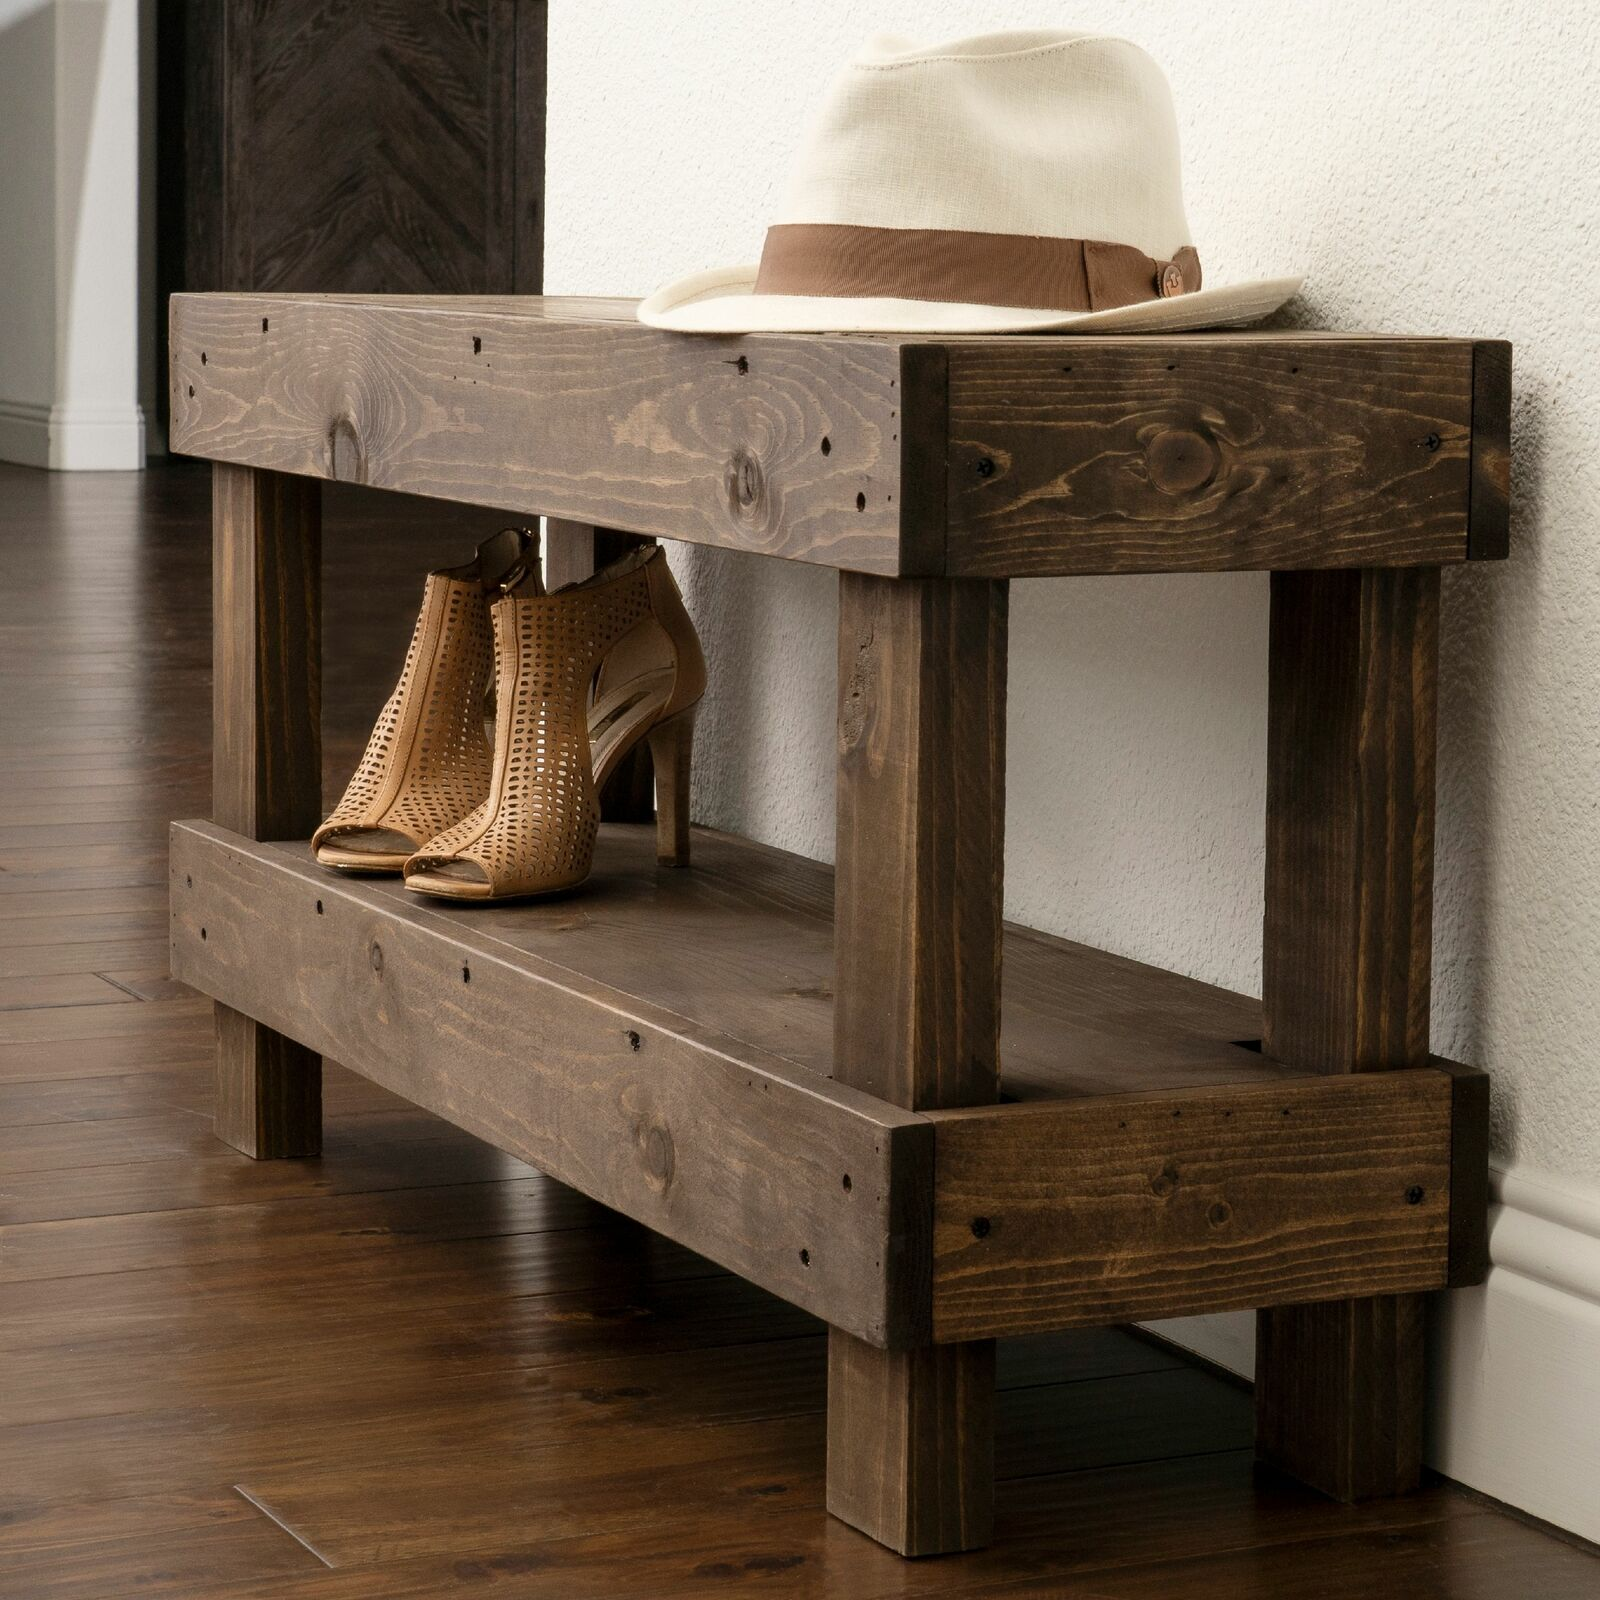 42 Modern Farmhouse Entryway Storage Bench Rustic Oak For Sale Online Ebay